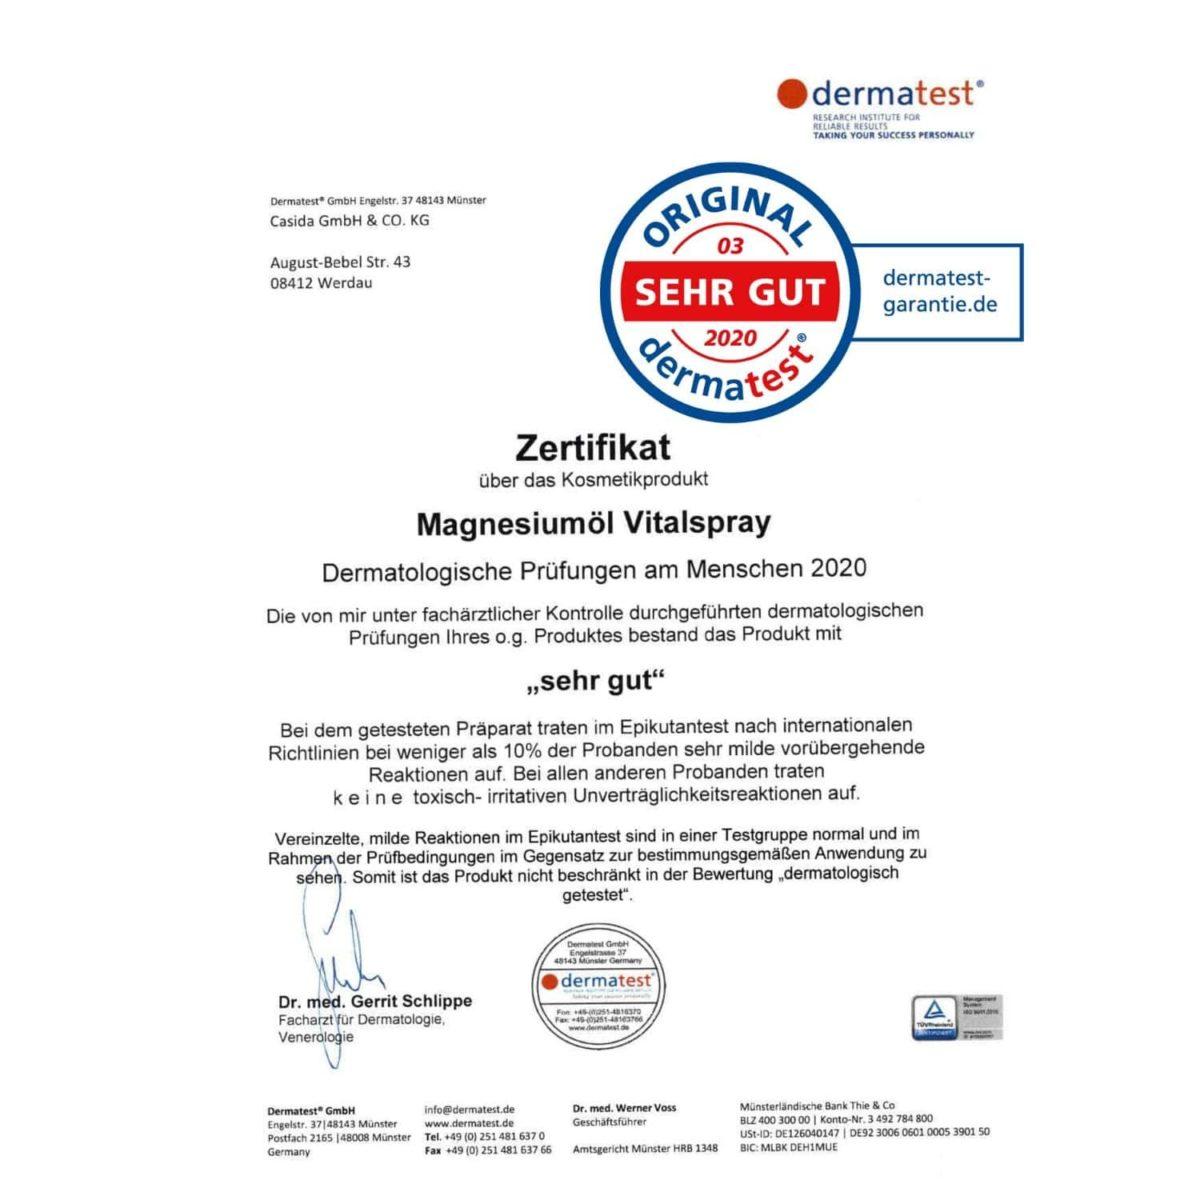 Dermatest Testsieger Casida Magnesiumöl Vitalspray Apotheke PZN 11219463